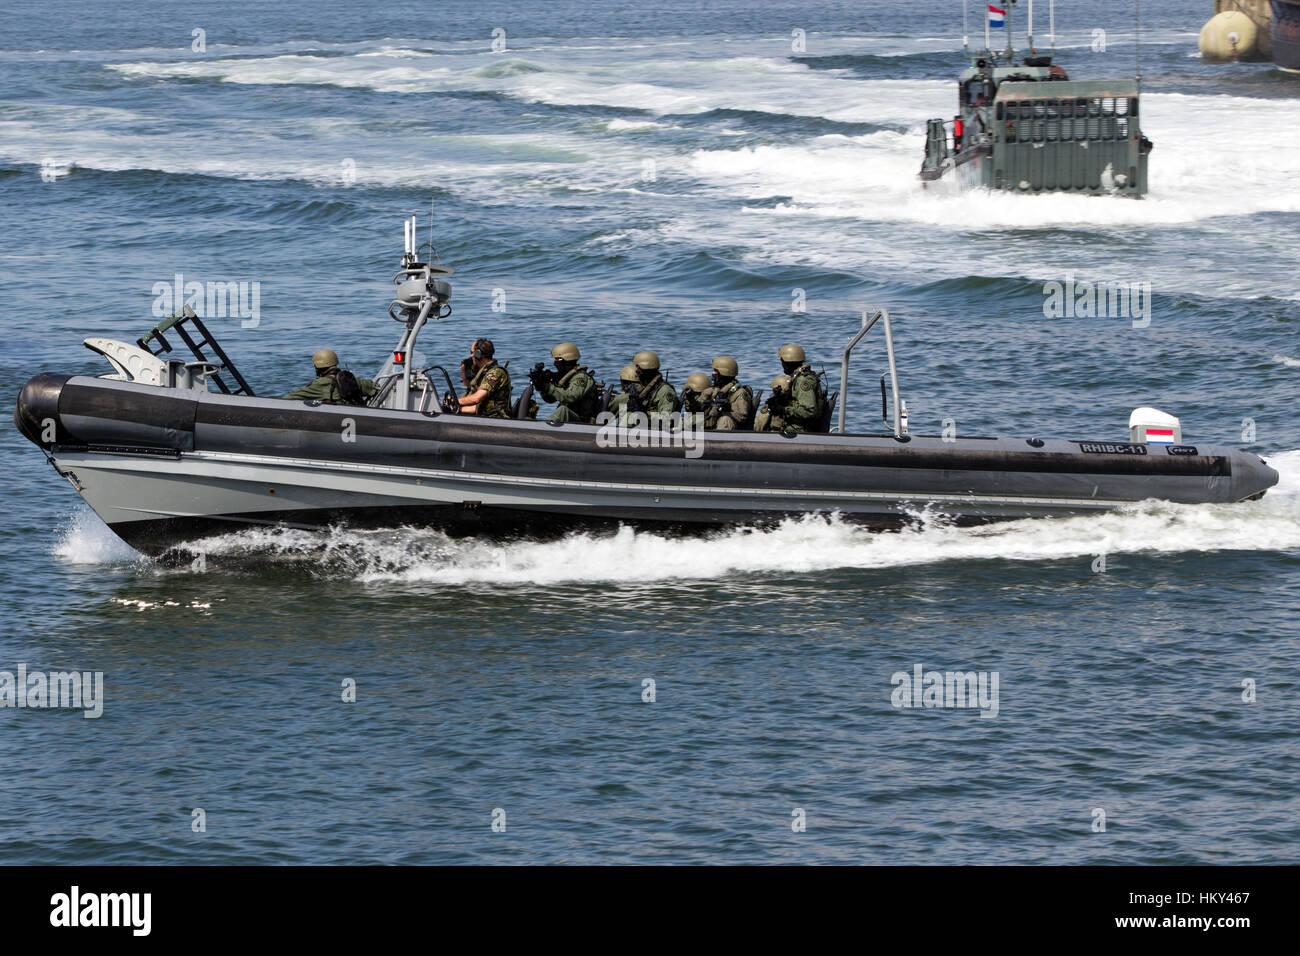 Den Helder The Netherlands July 7 Dutch Swat Team In A Speedboat Stock Photo Alamy